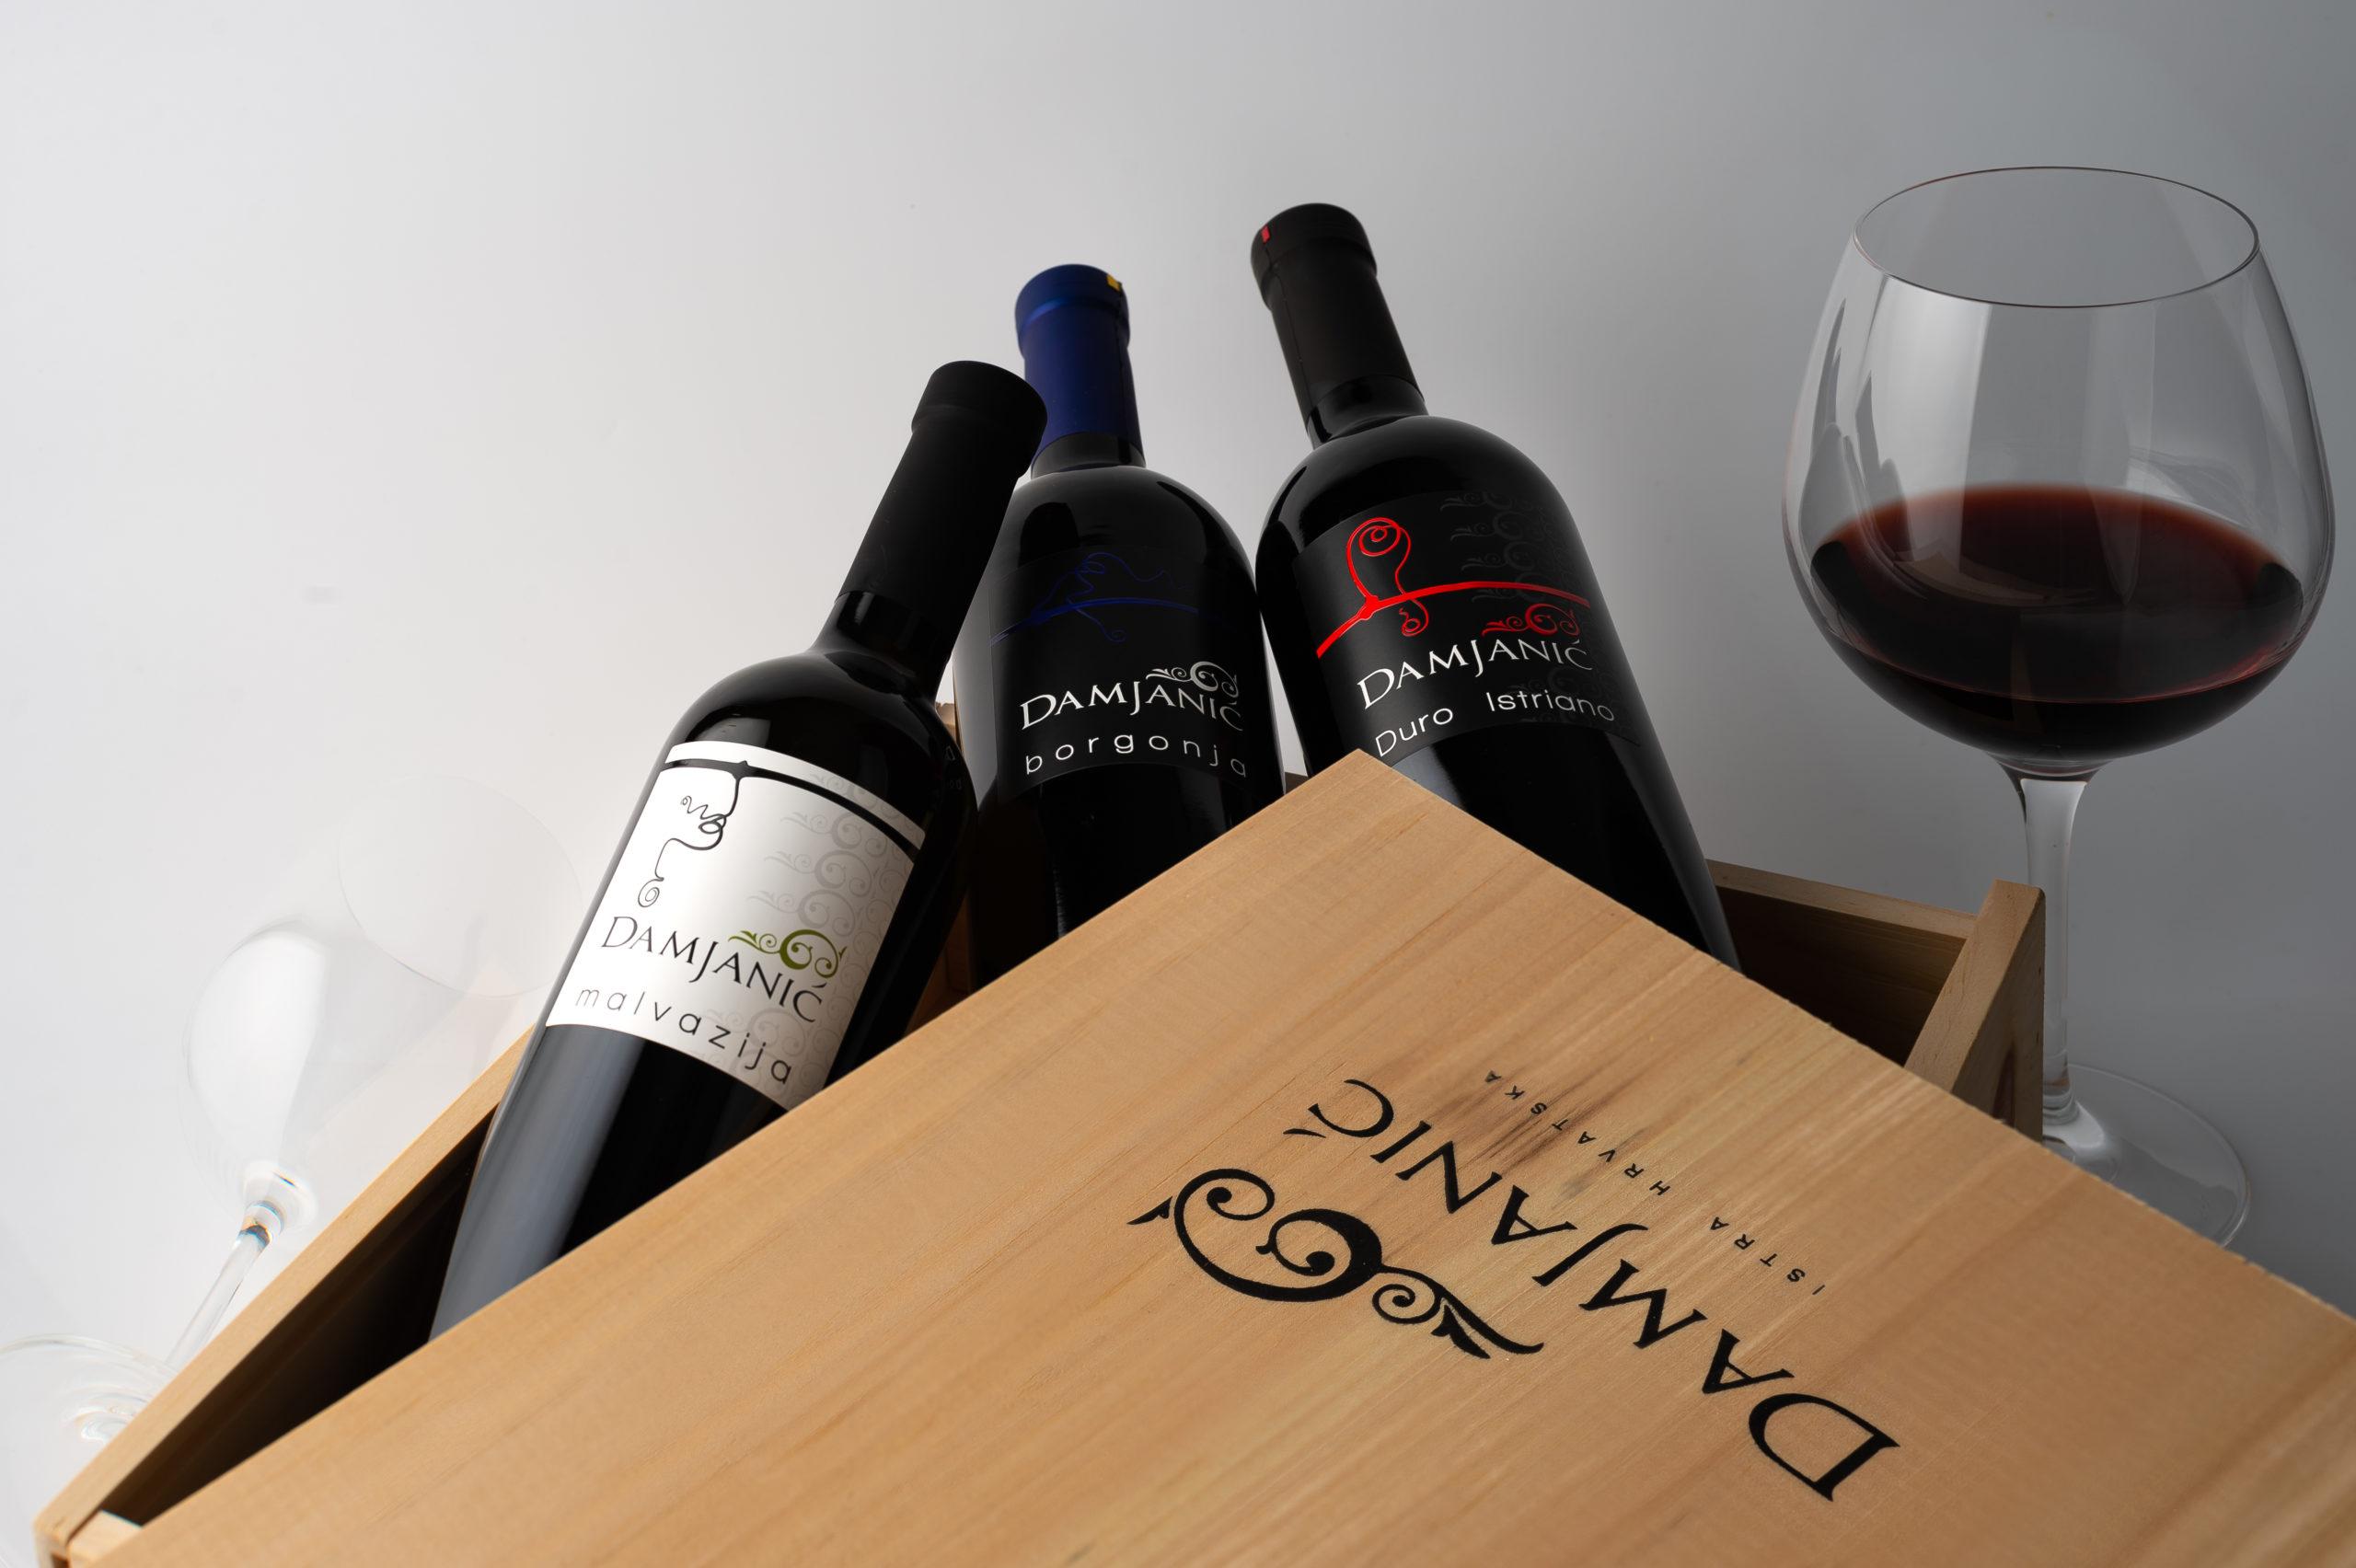 hren   plethora of creativity // Damjanić winery product photography